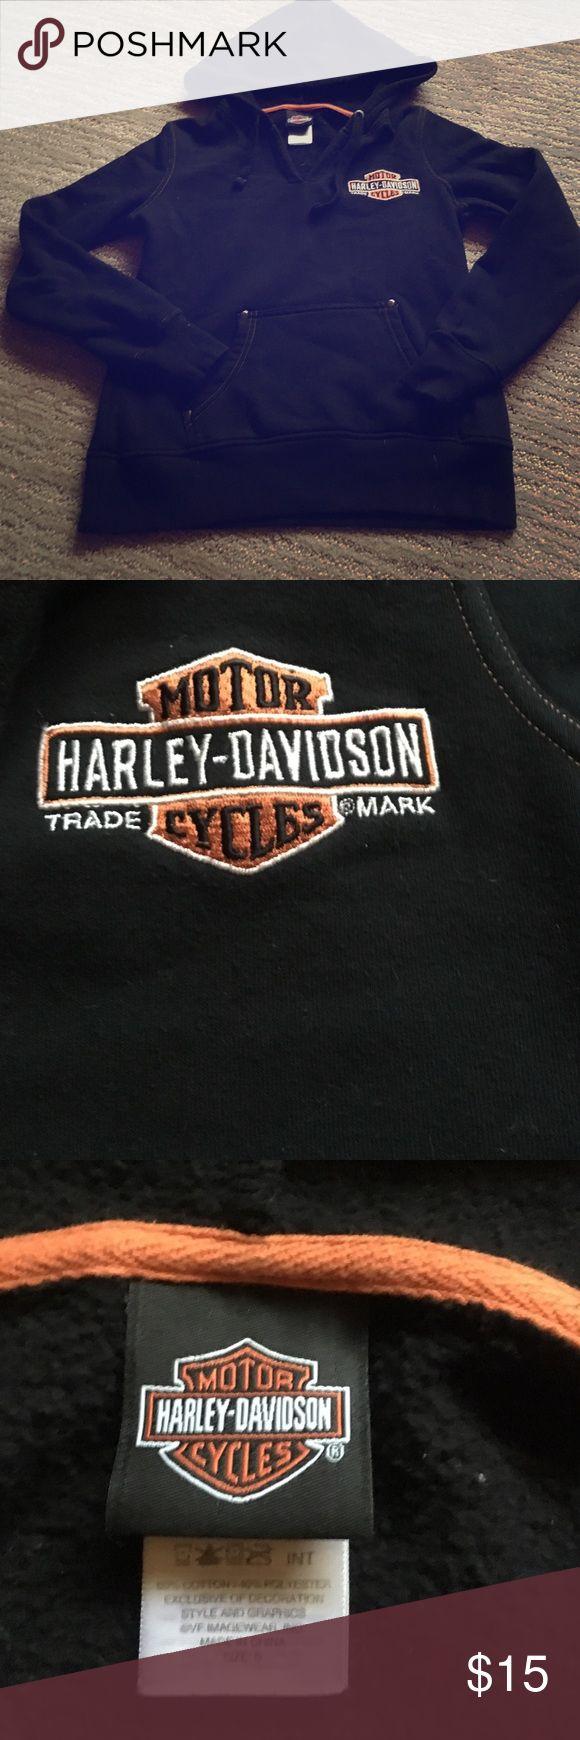 Harley Davidson Sweatshirt Harley Davidson Sweatshirt. Excellent condition. Great details! Bundle to save! Harley-Davidson Other